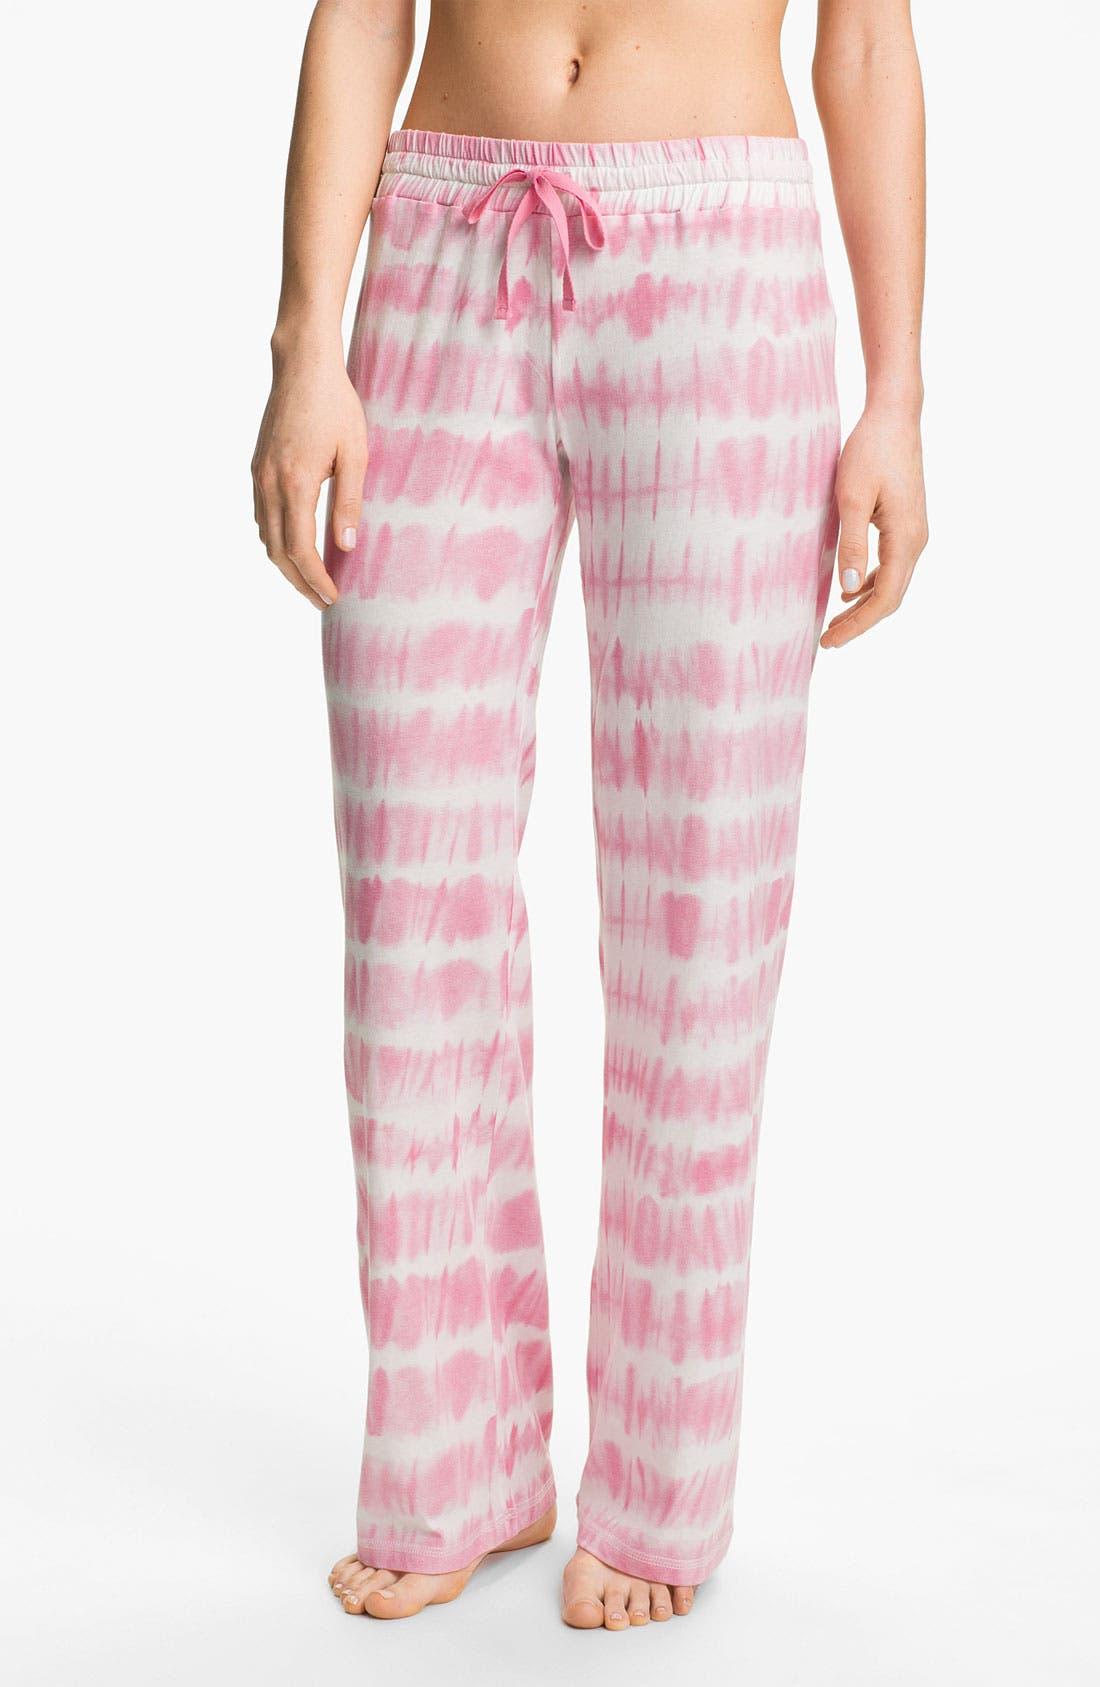 Alternate Image 1 Selected - PJ Salvage 'Pink Dyes' Pajama Pants